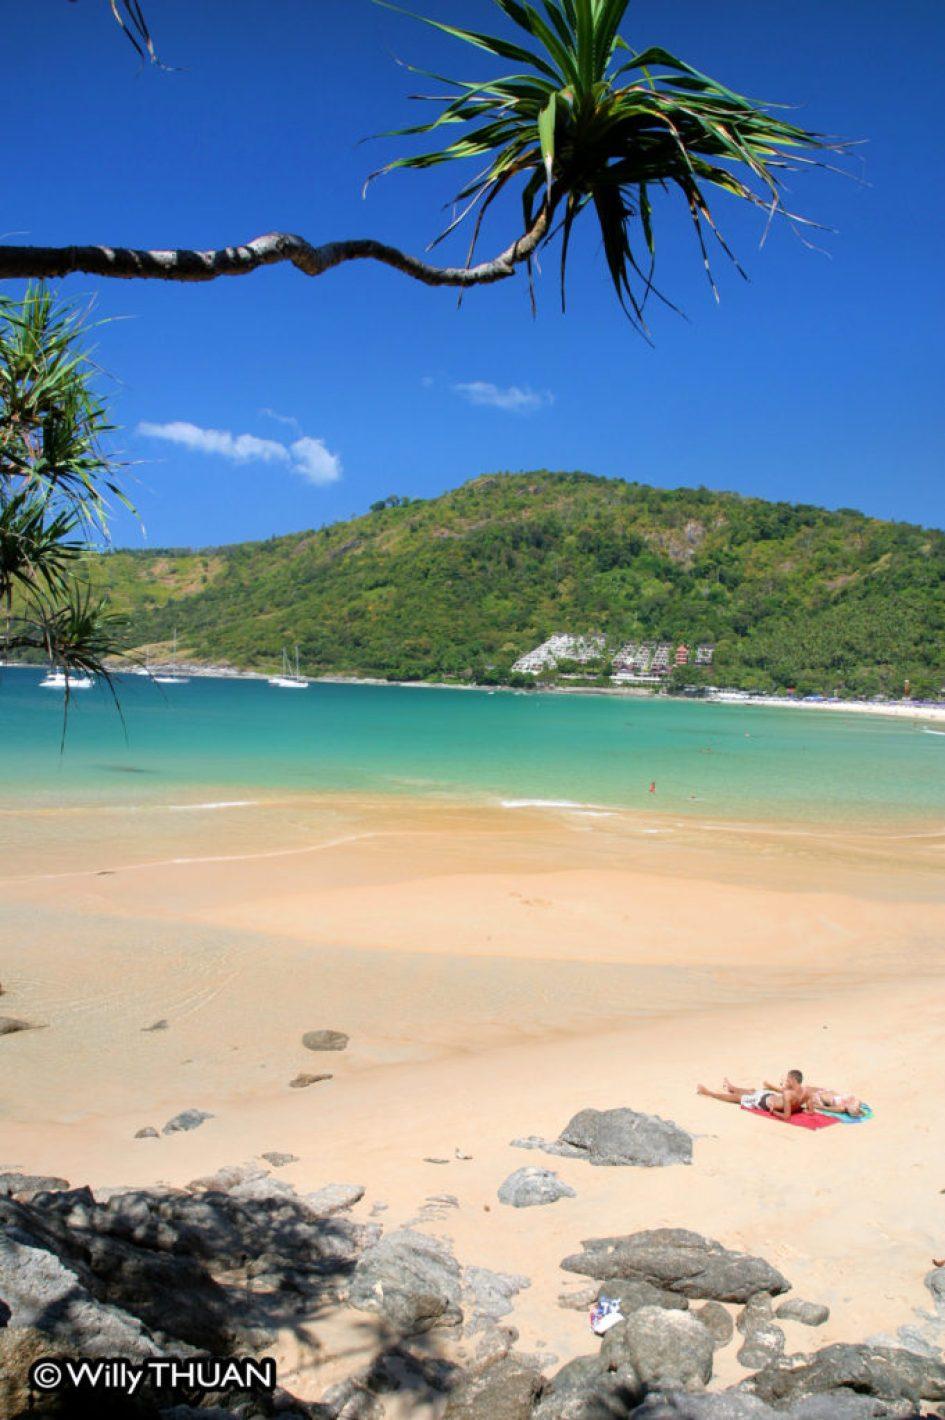 Nai Harn Beach in South Phuket